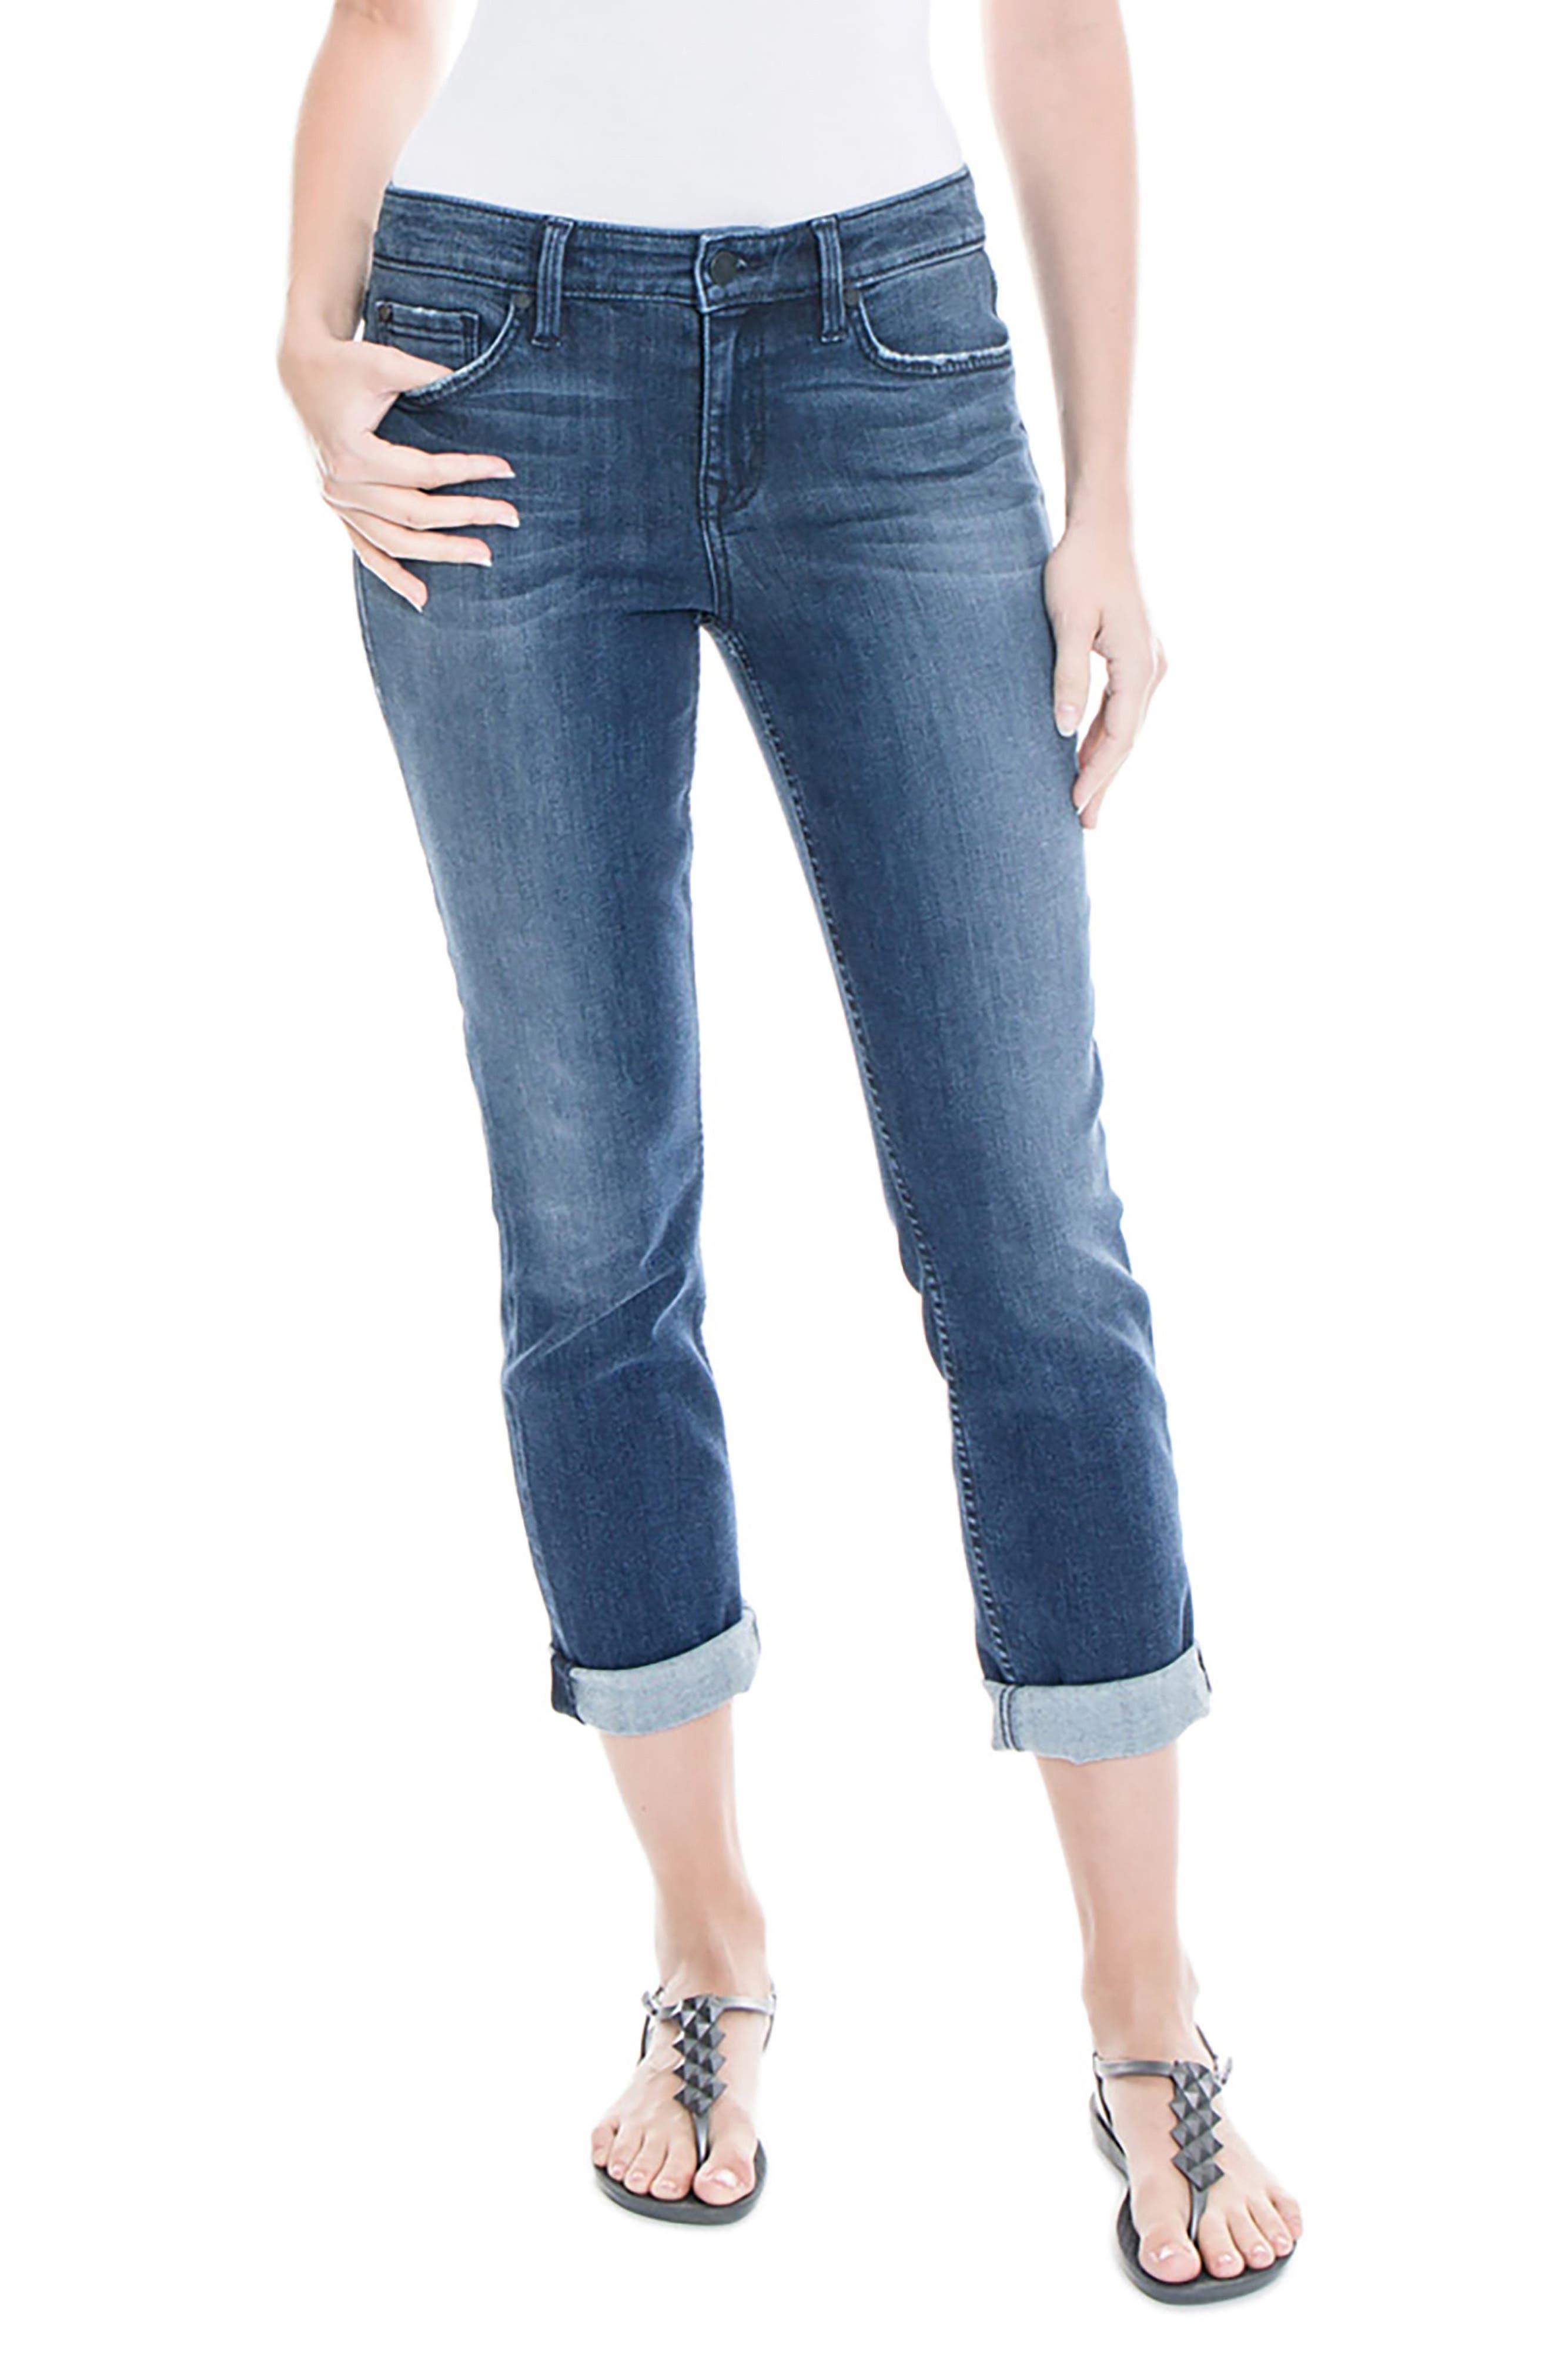 Level 99 Lily Stretch Distressed Crop Cuff Jeans